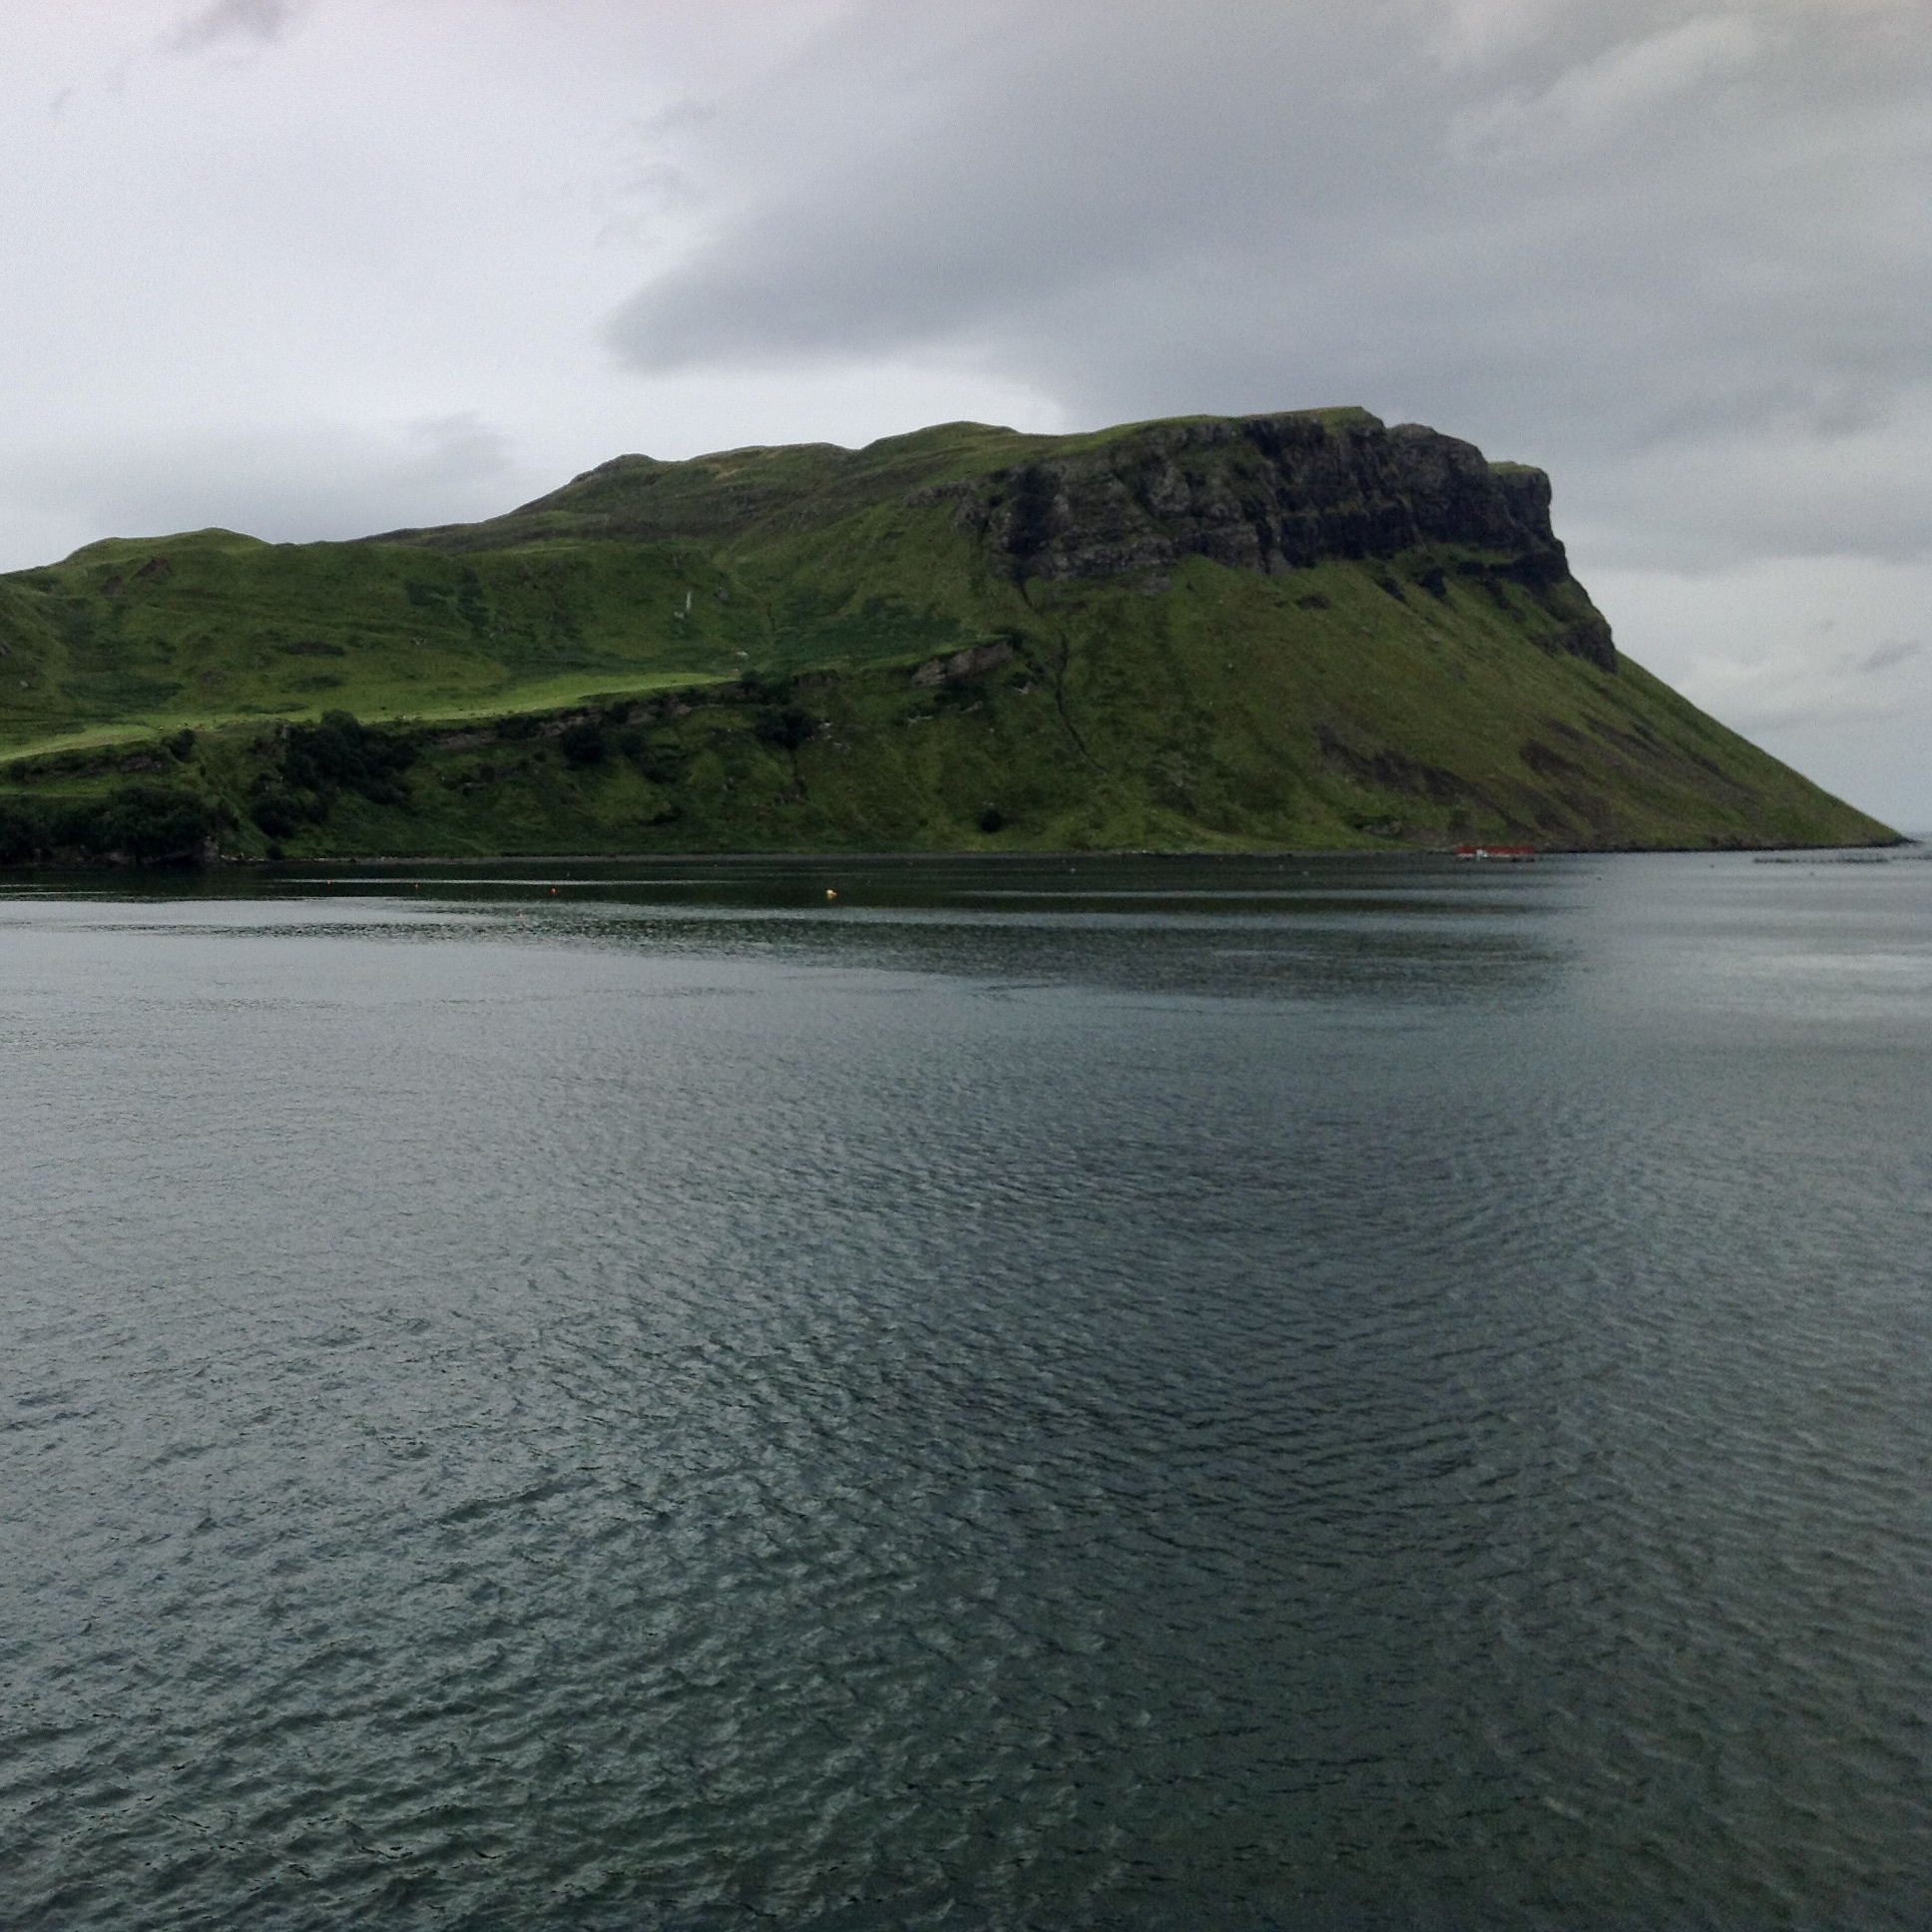 Ahhhh, Scotland!